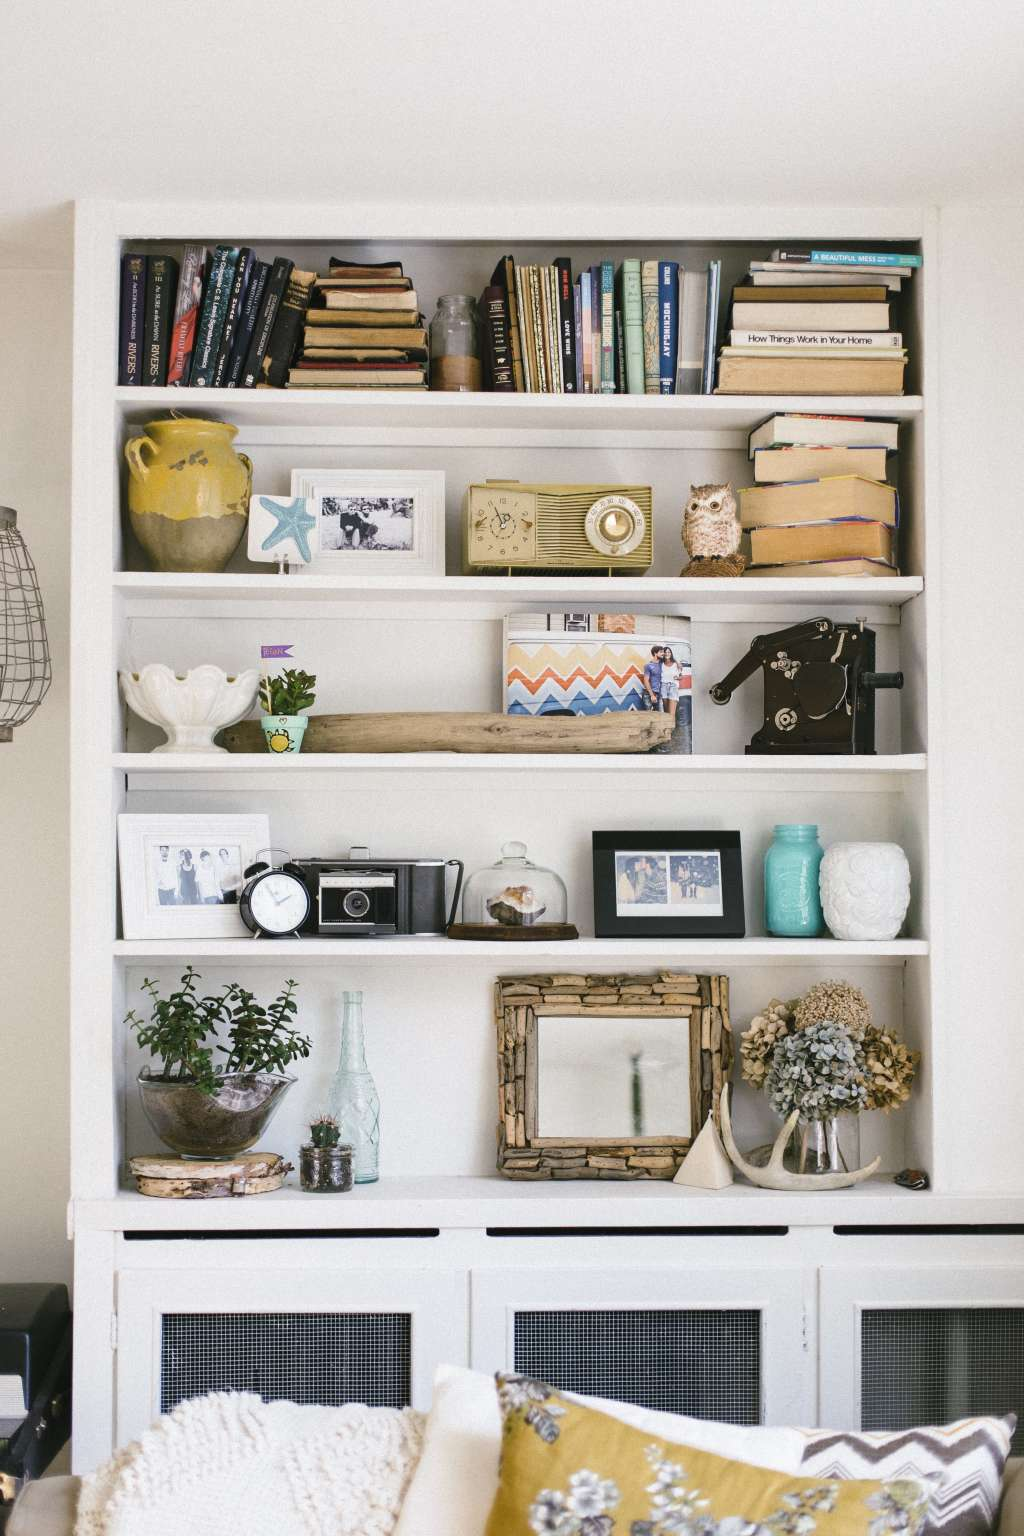 Instant Room Refresh: 9 Shelf Styling Ideas